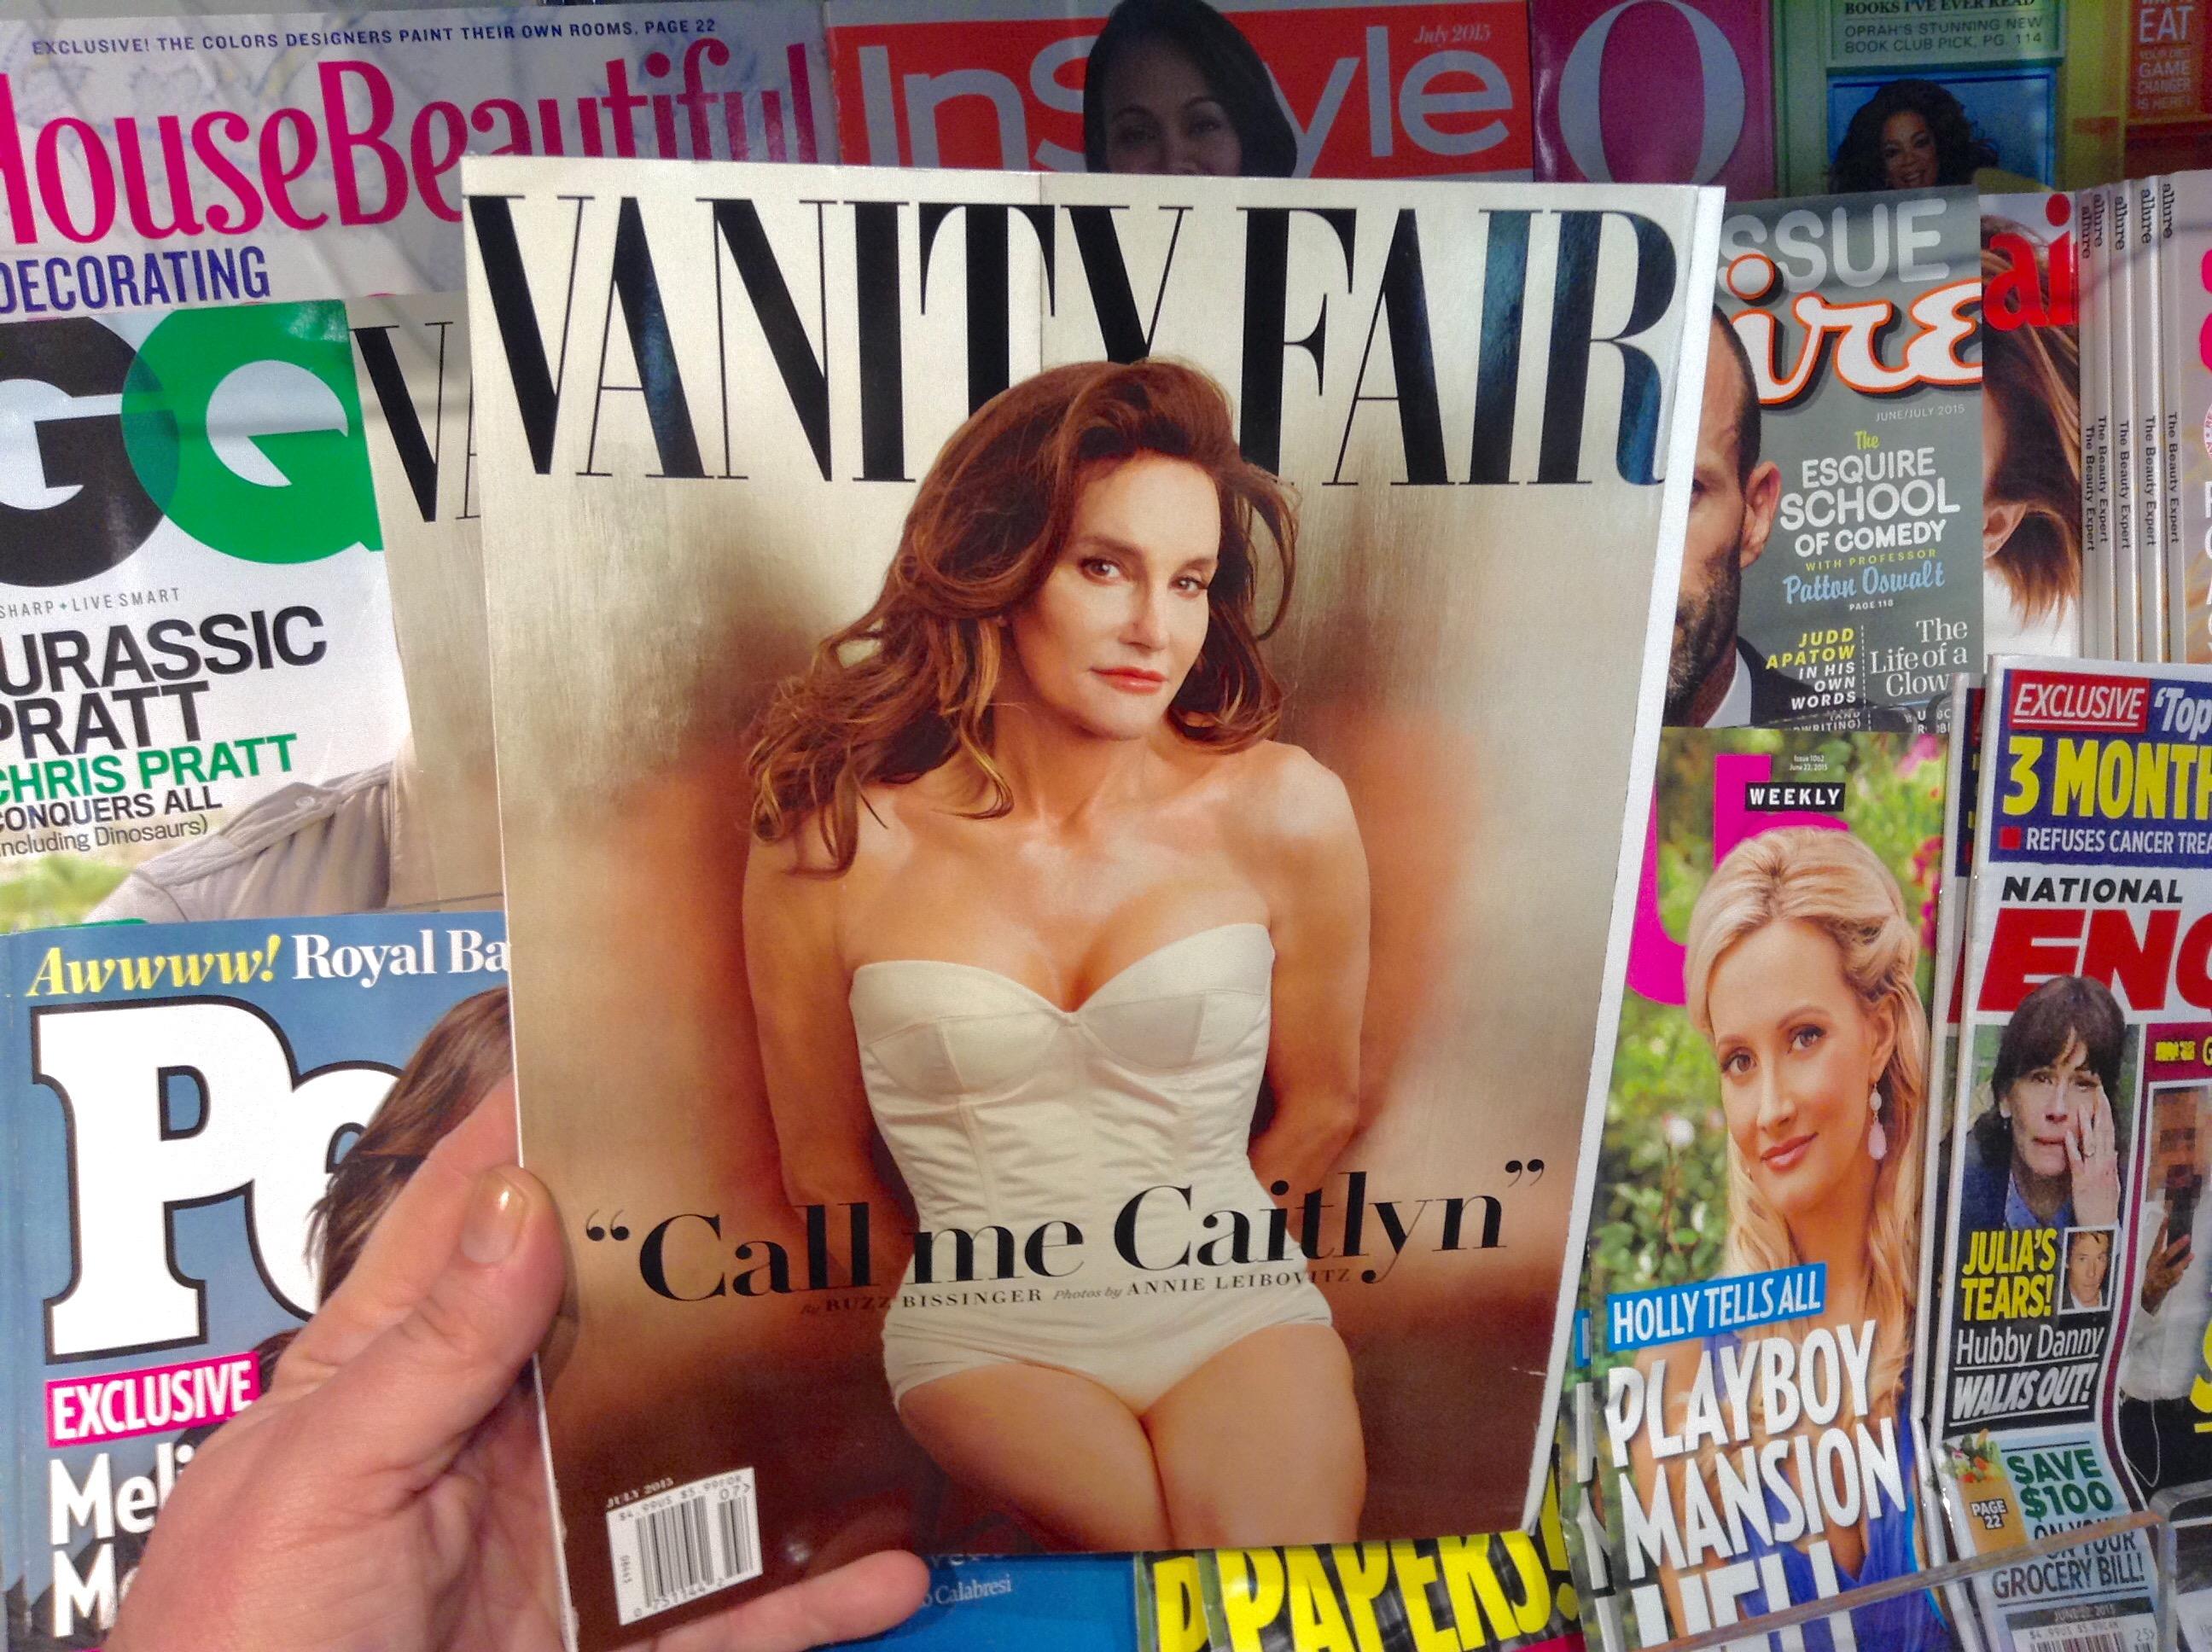 Caitlyn Jenner's famous Vanity Fair cover